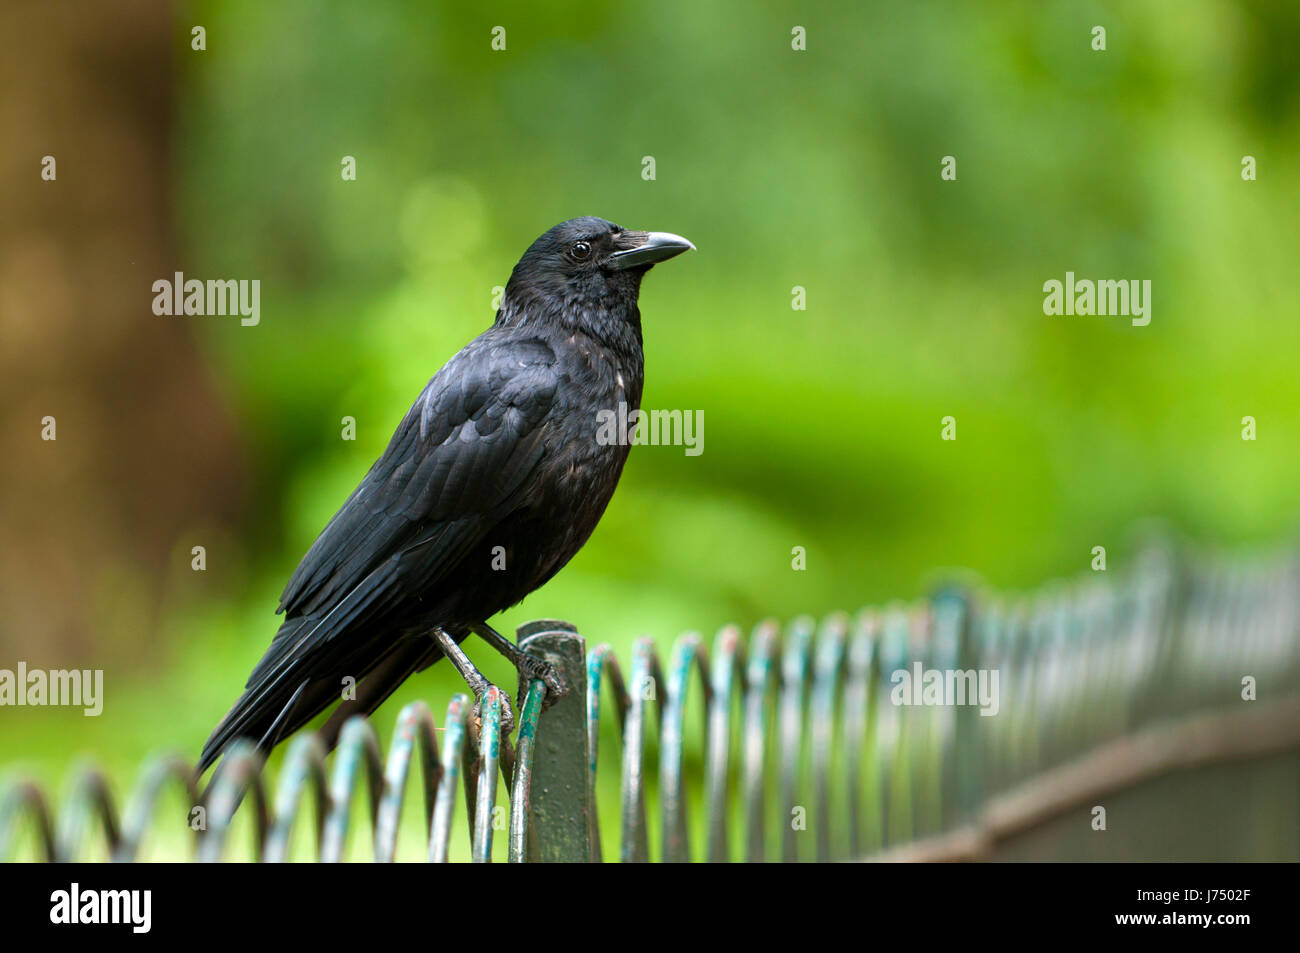 black swarthy jetblack deep black raven lawn green backdrop background close - Stock Image